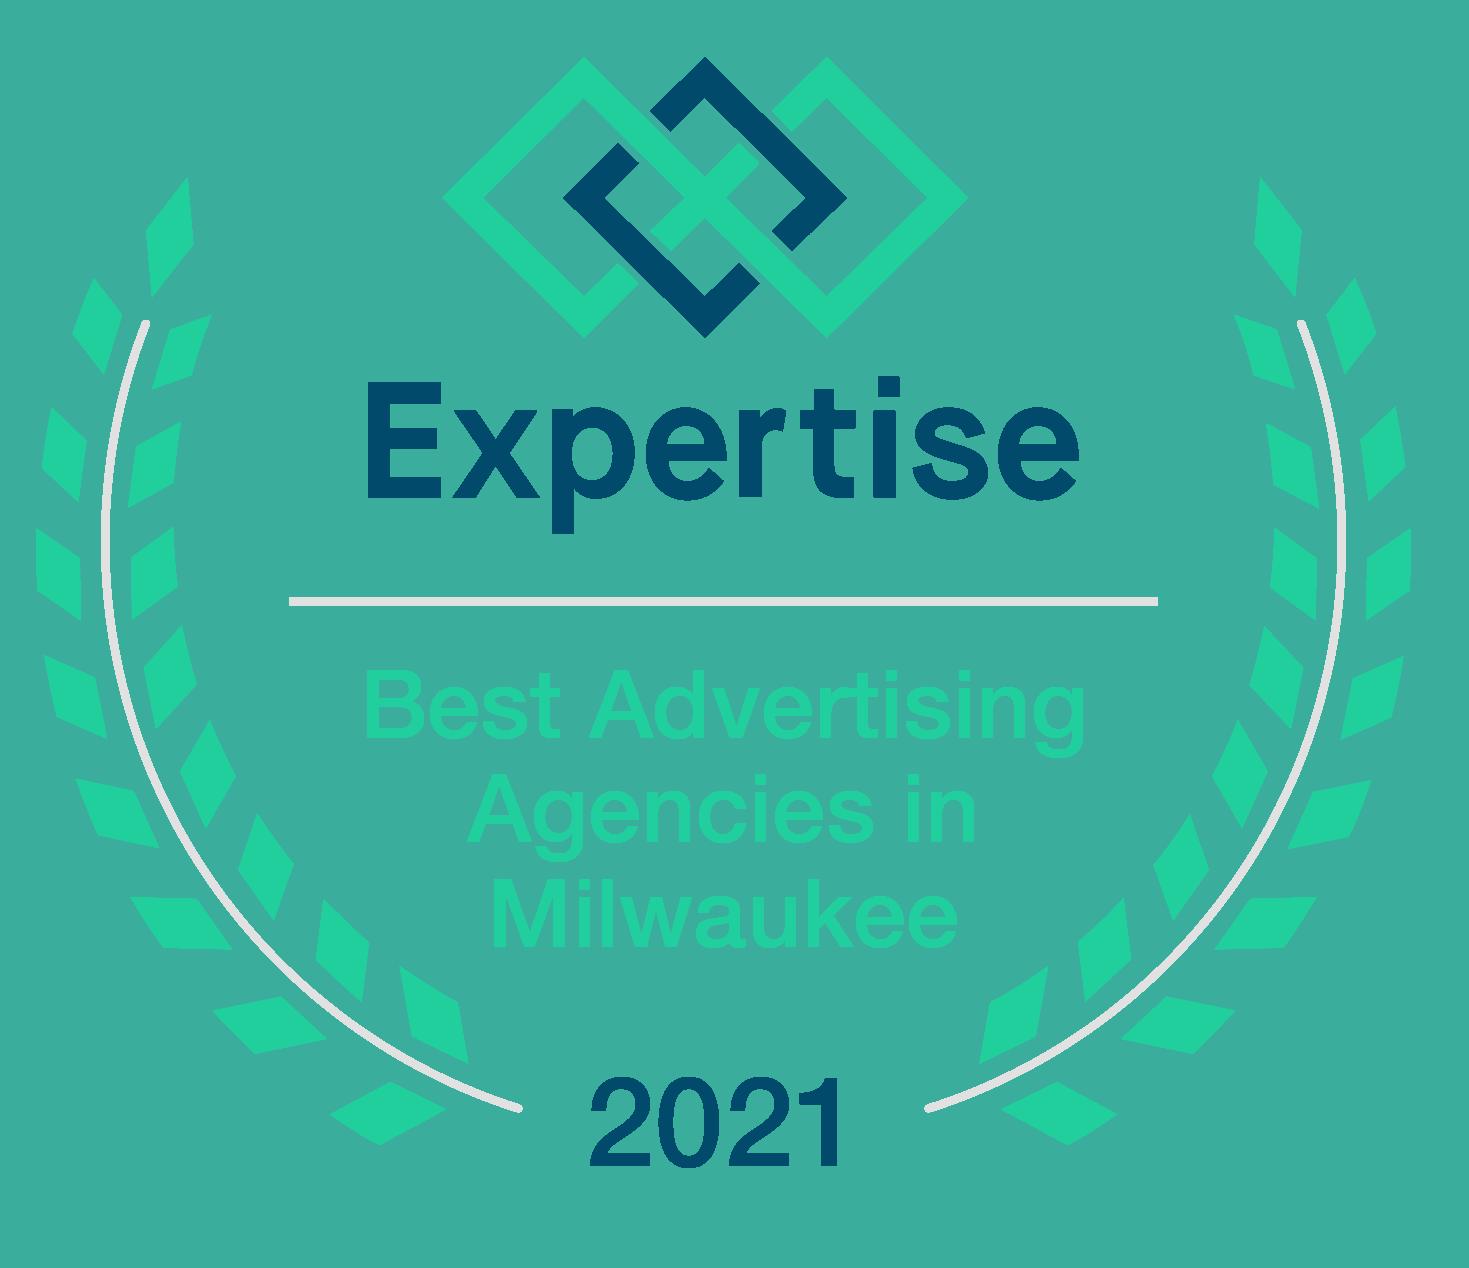 Best Advertising Agency in Milwaukee Award Badge